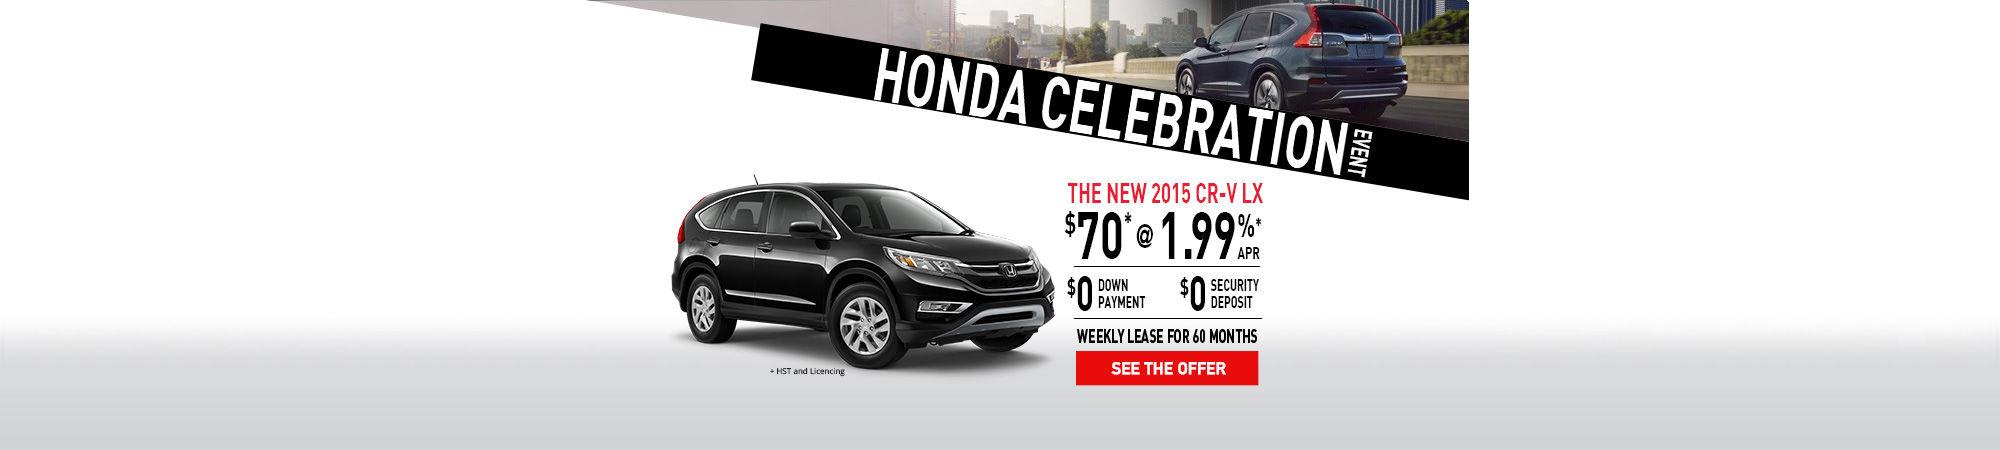 Honda Celebration - 2015 Honda CRV-February